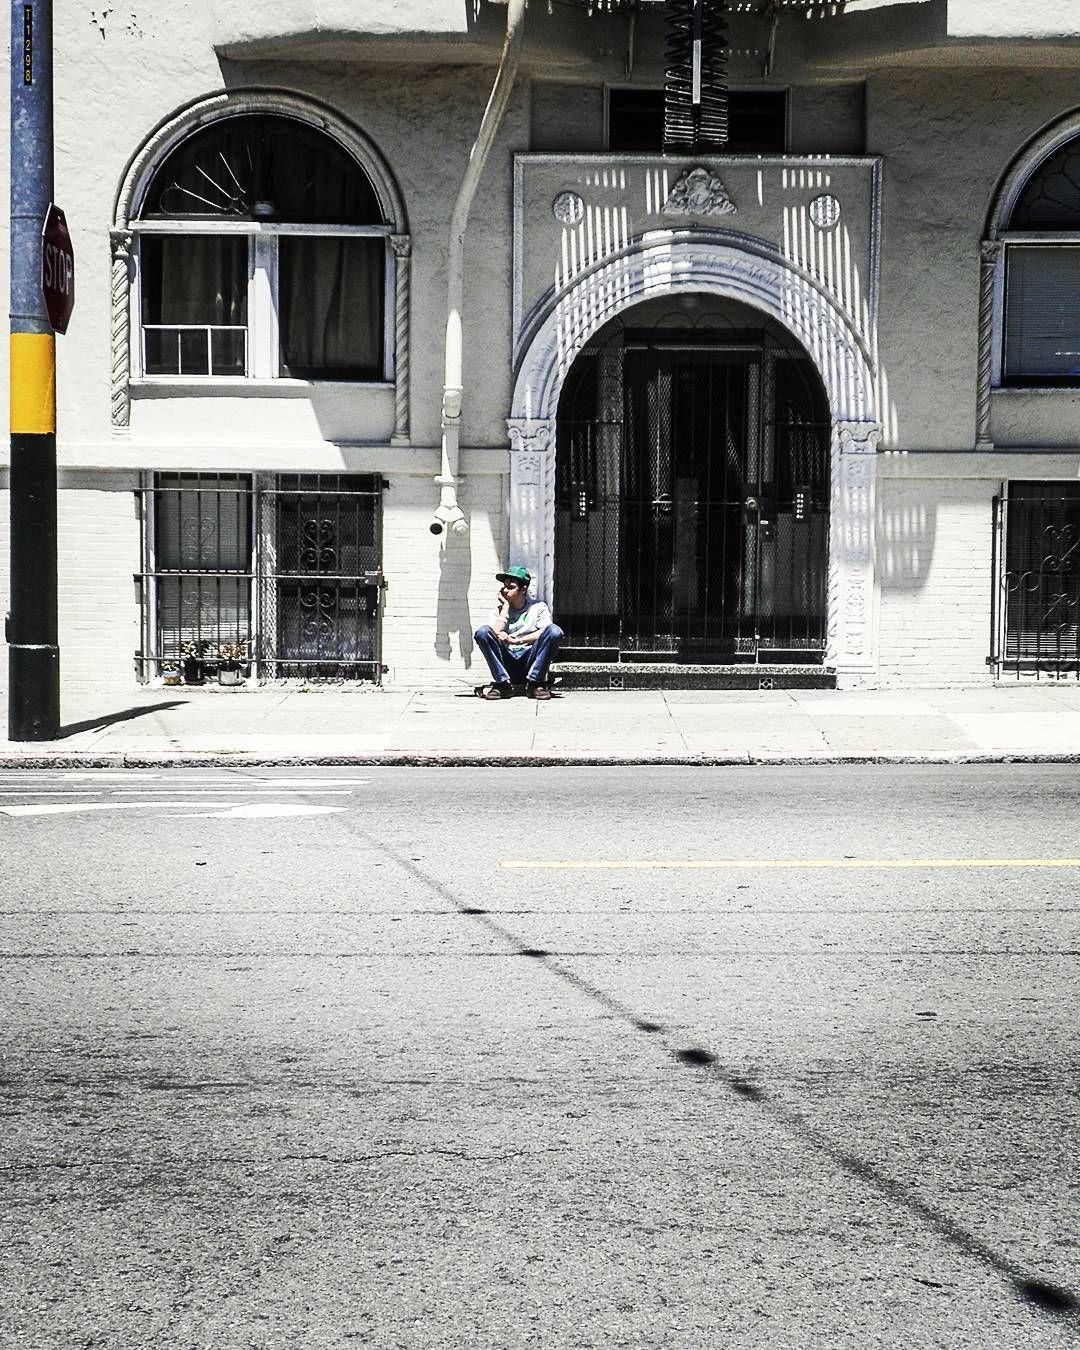 john ater / johnater.com / to purchase prints write johnater@johnater.com / follow me @ http://ift.tt/1QG4V3F @ http://twitter.com/johnater/  #art #artist #artjunkie #artlover #artwork #artworld #contemporaryart #creative #fineart #fineartphotography #guerillaart #minimalism #modernart #newartwork #photo #photographyart #photograph #photography #photos #popart #sanfrancisco #streetart #streetphotography #urbanart #urban